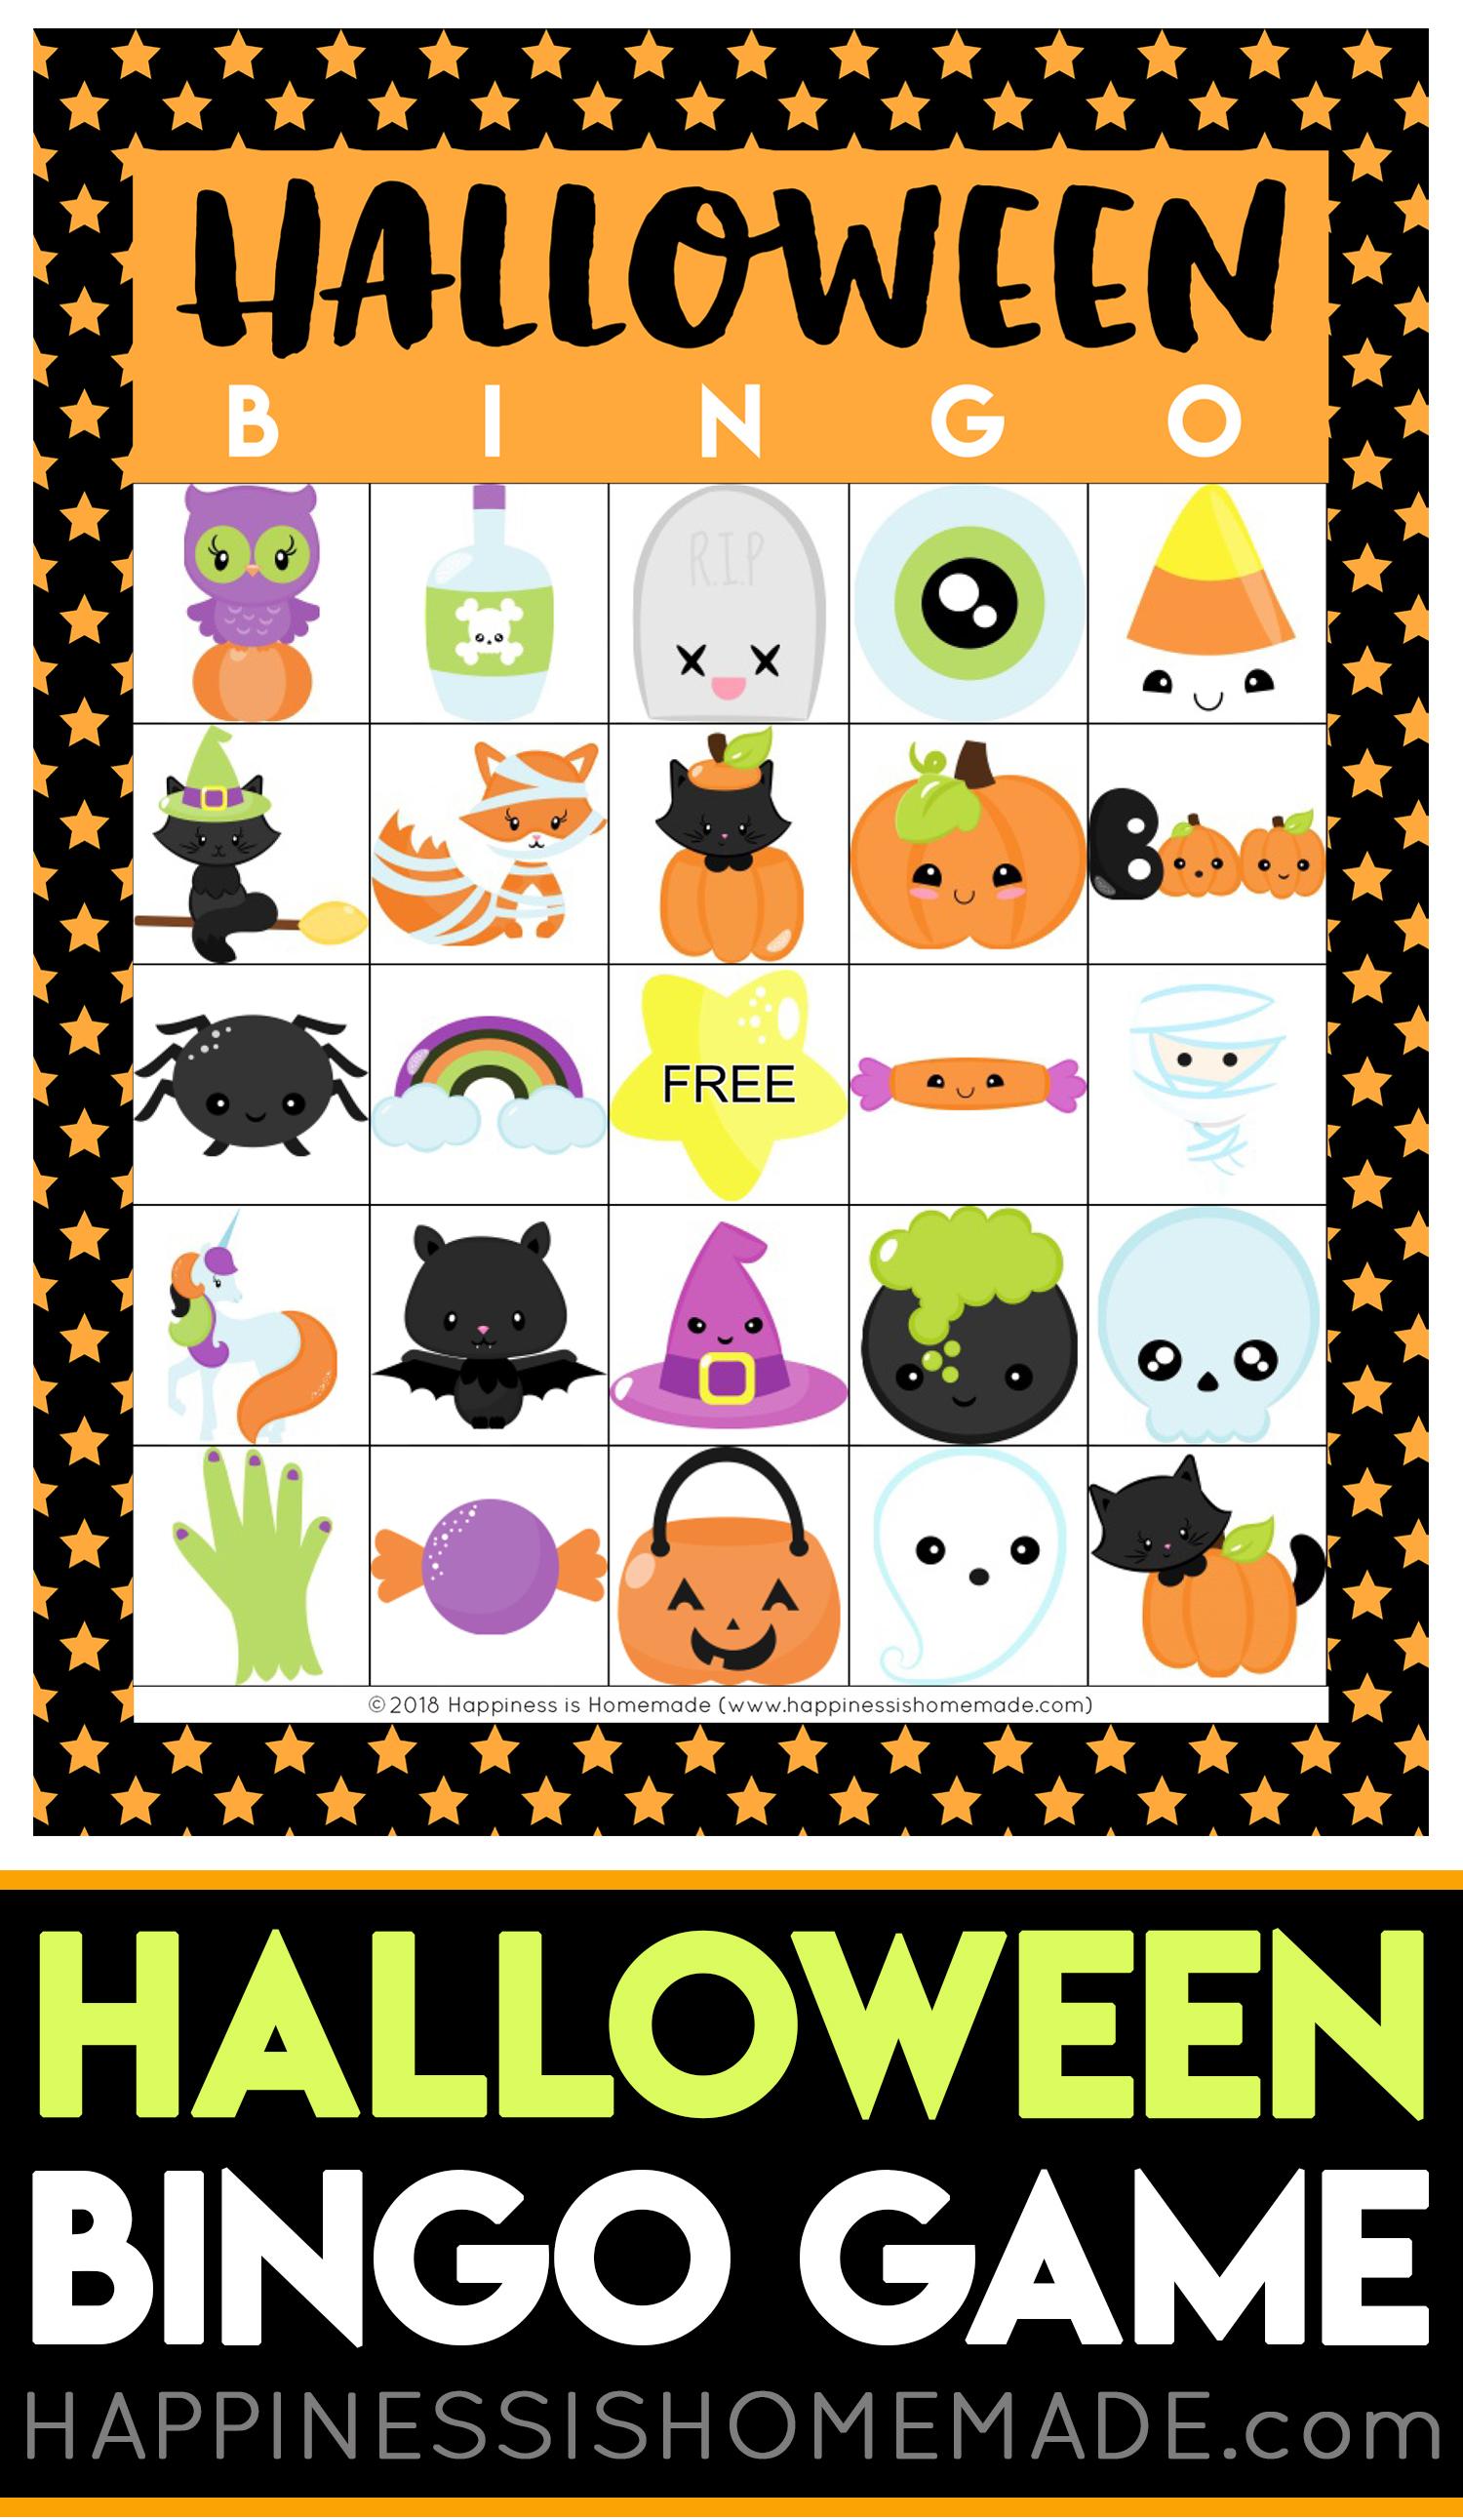 Printable Halloween Bingo Cards - Happiness Is Homemade - Free Printable Halloween Bingo Cards